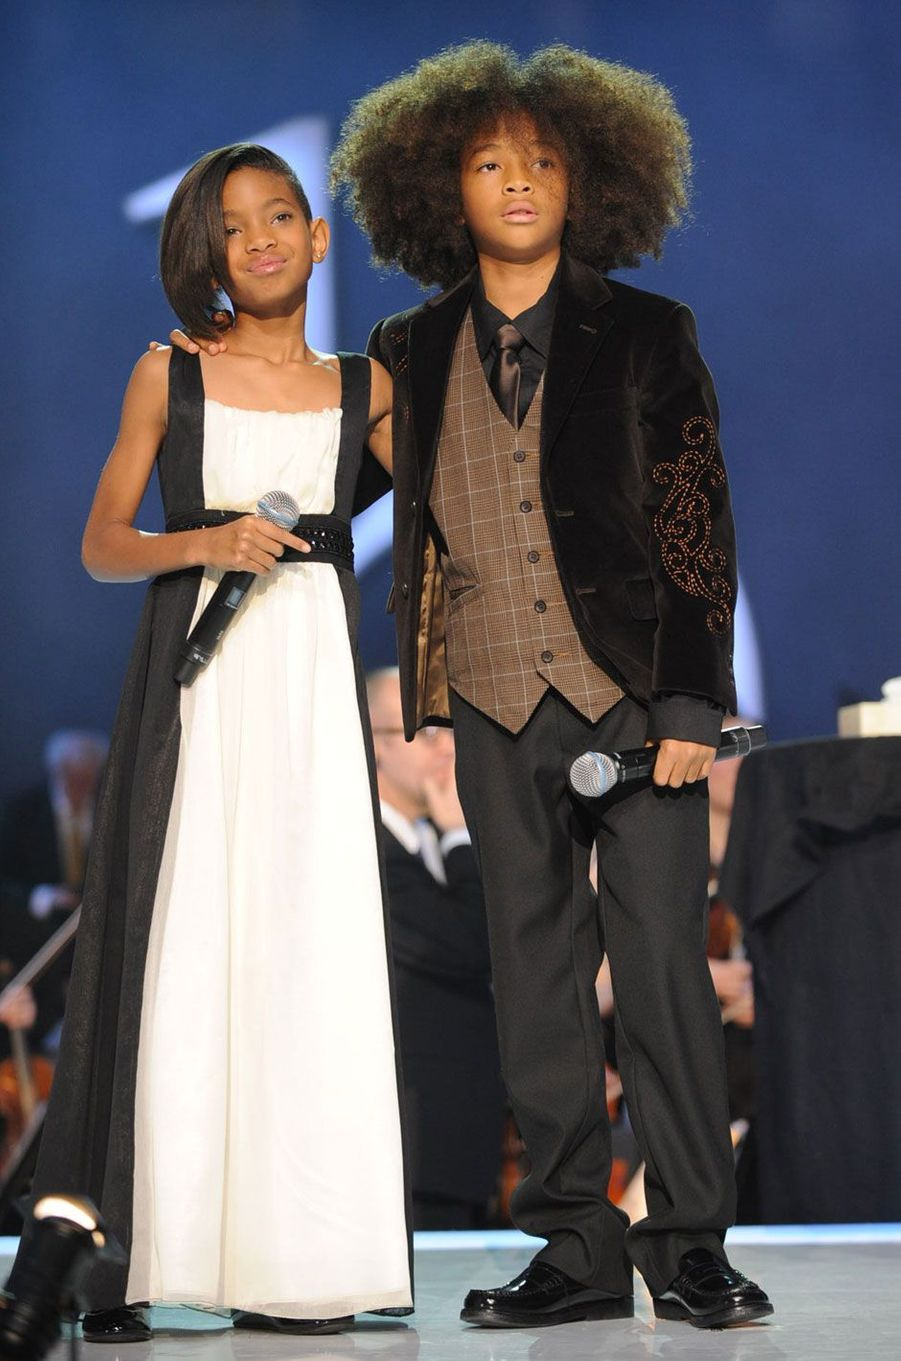 Willow Smith et son frère Jaden en 2009